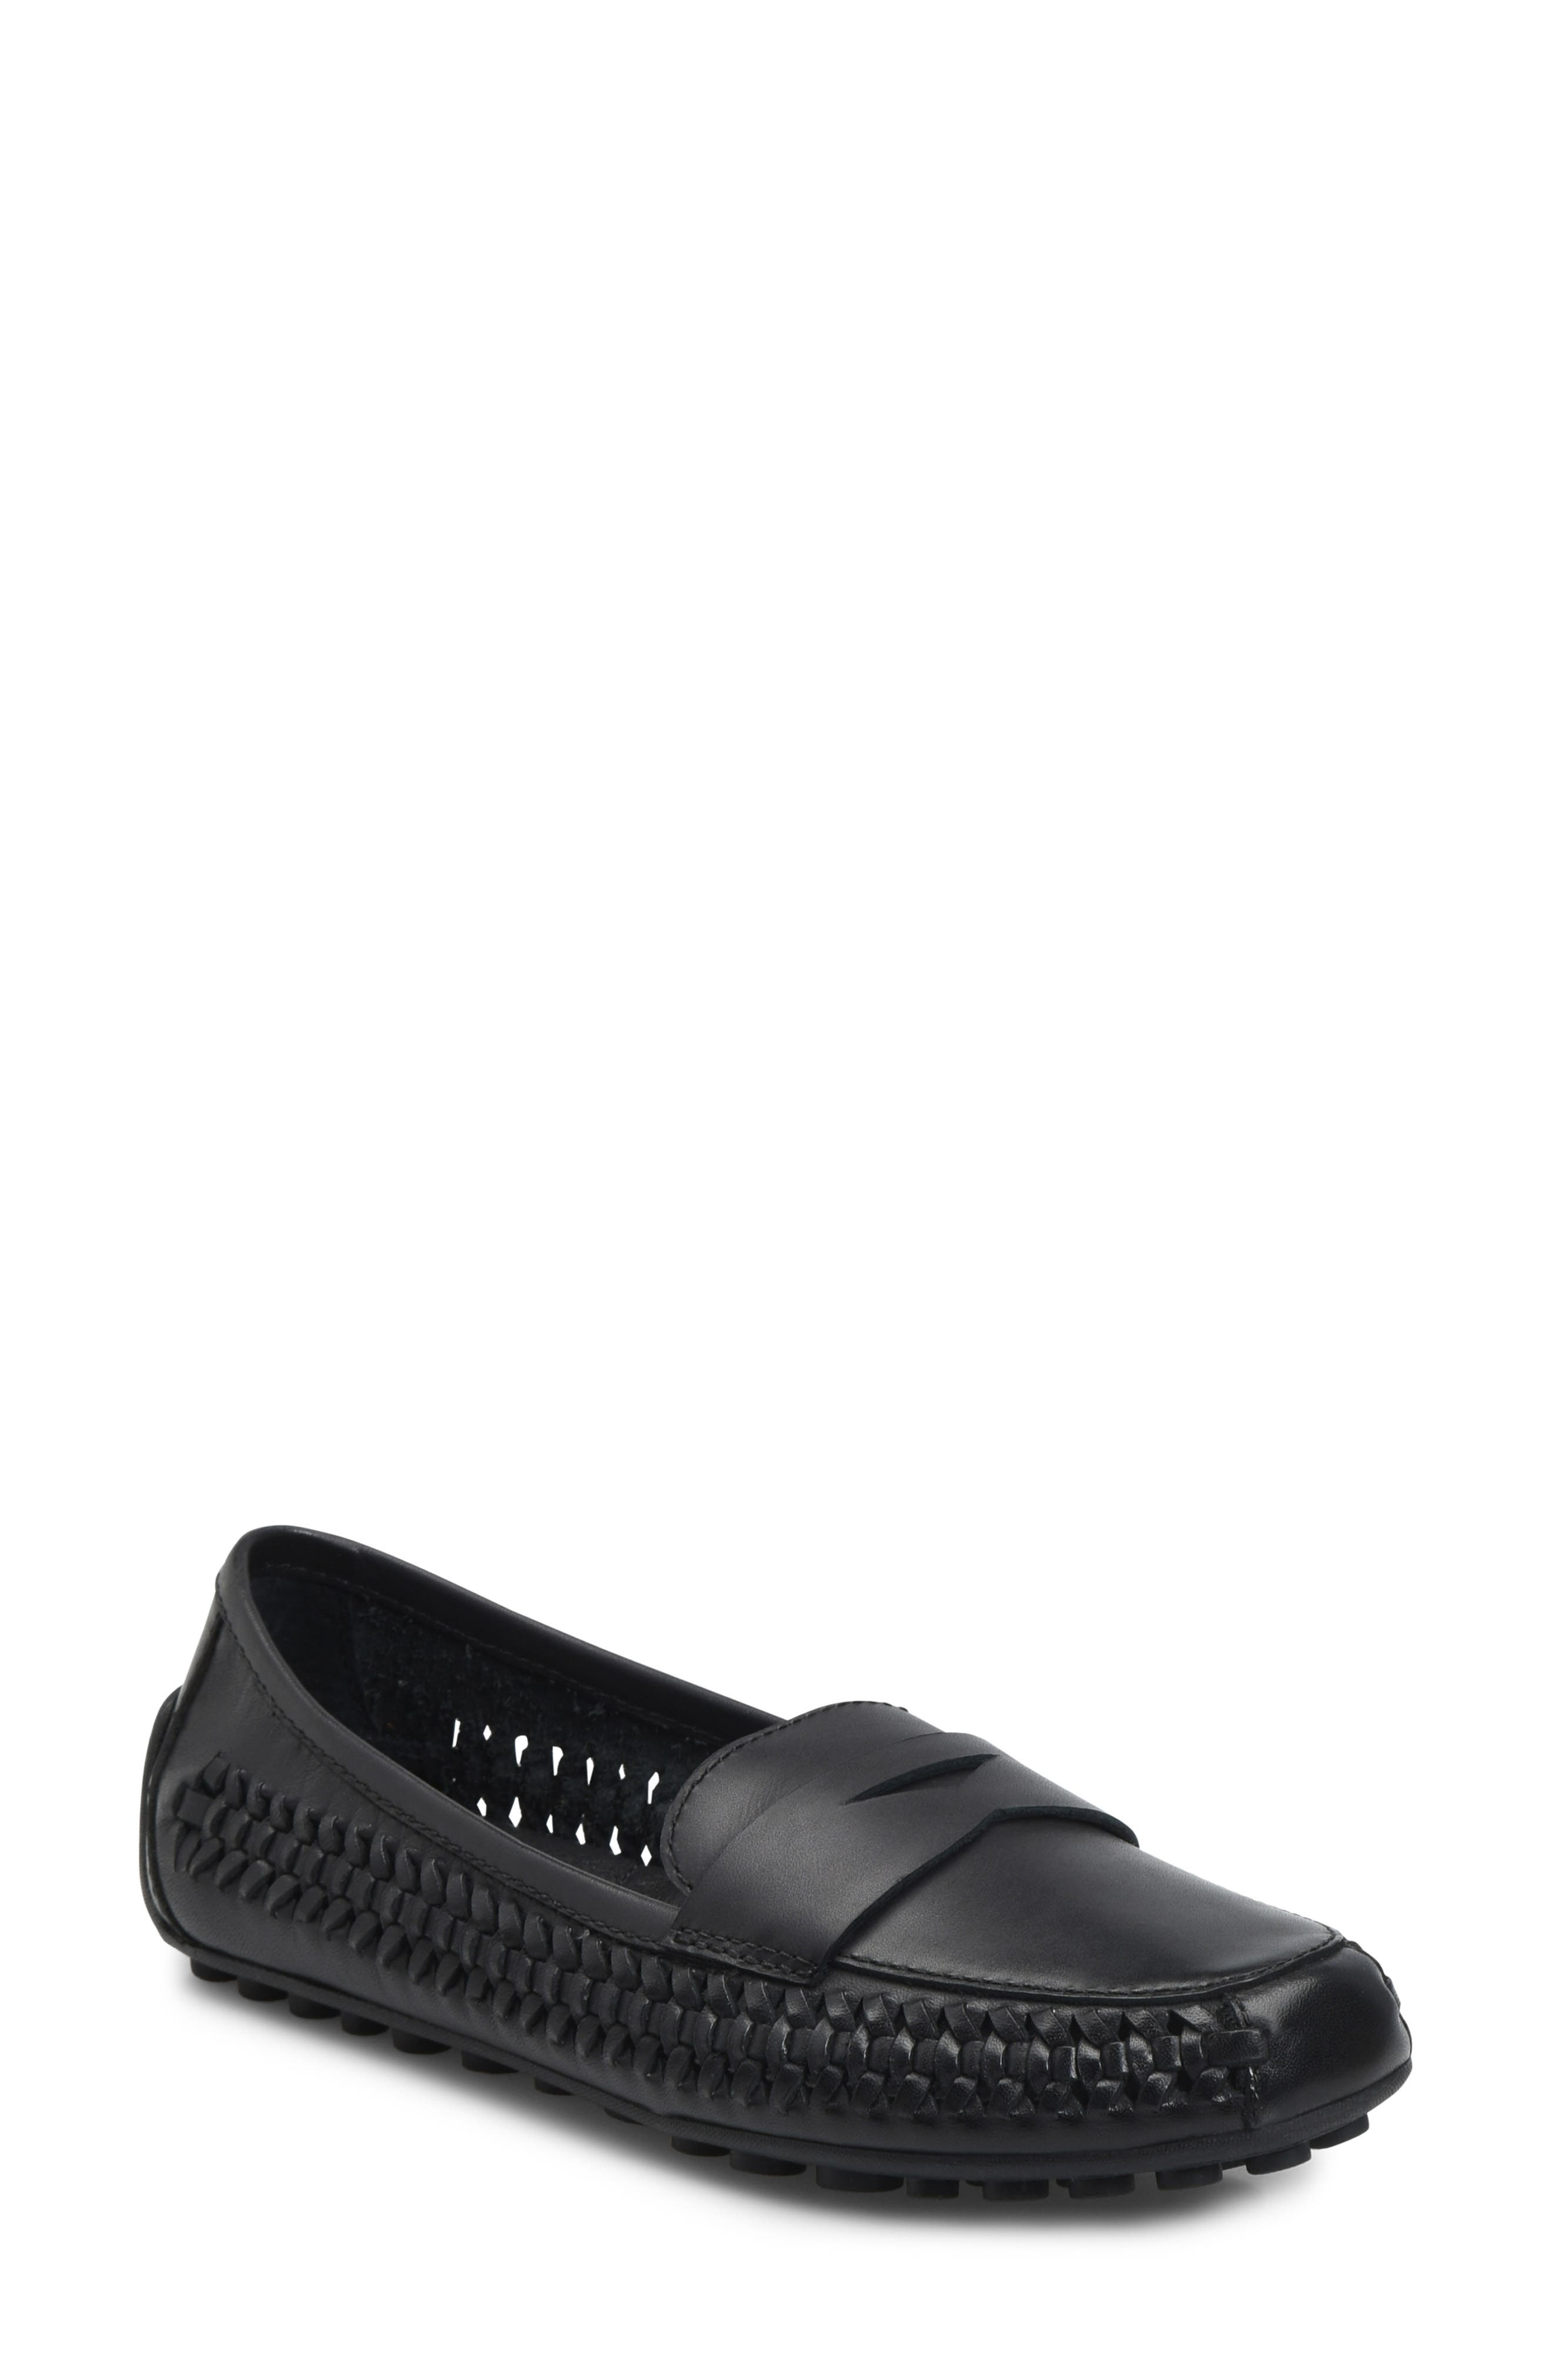 B?rn Malena Driving Loafer, Black